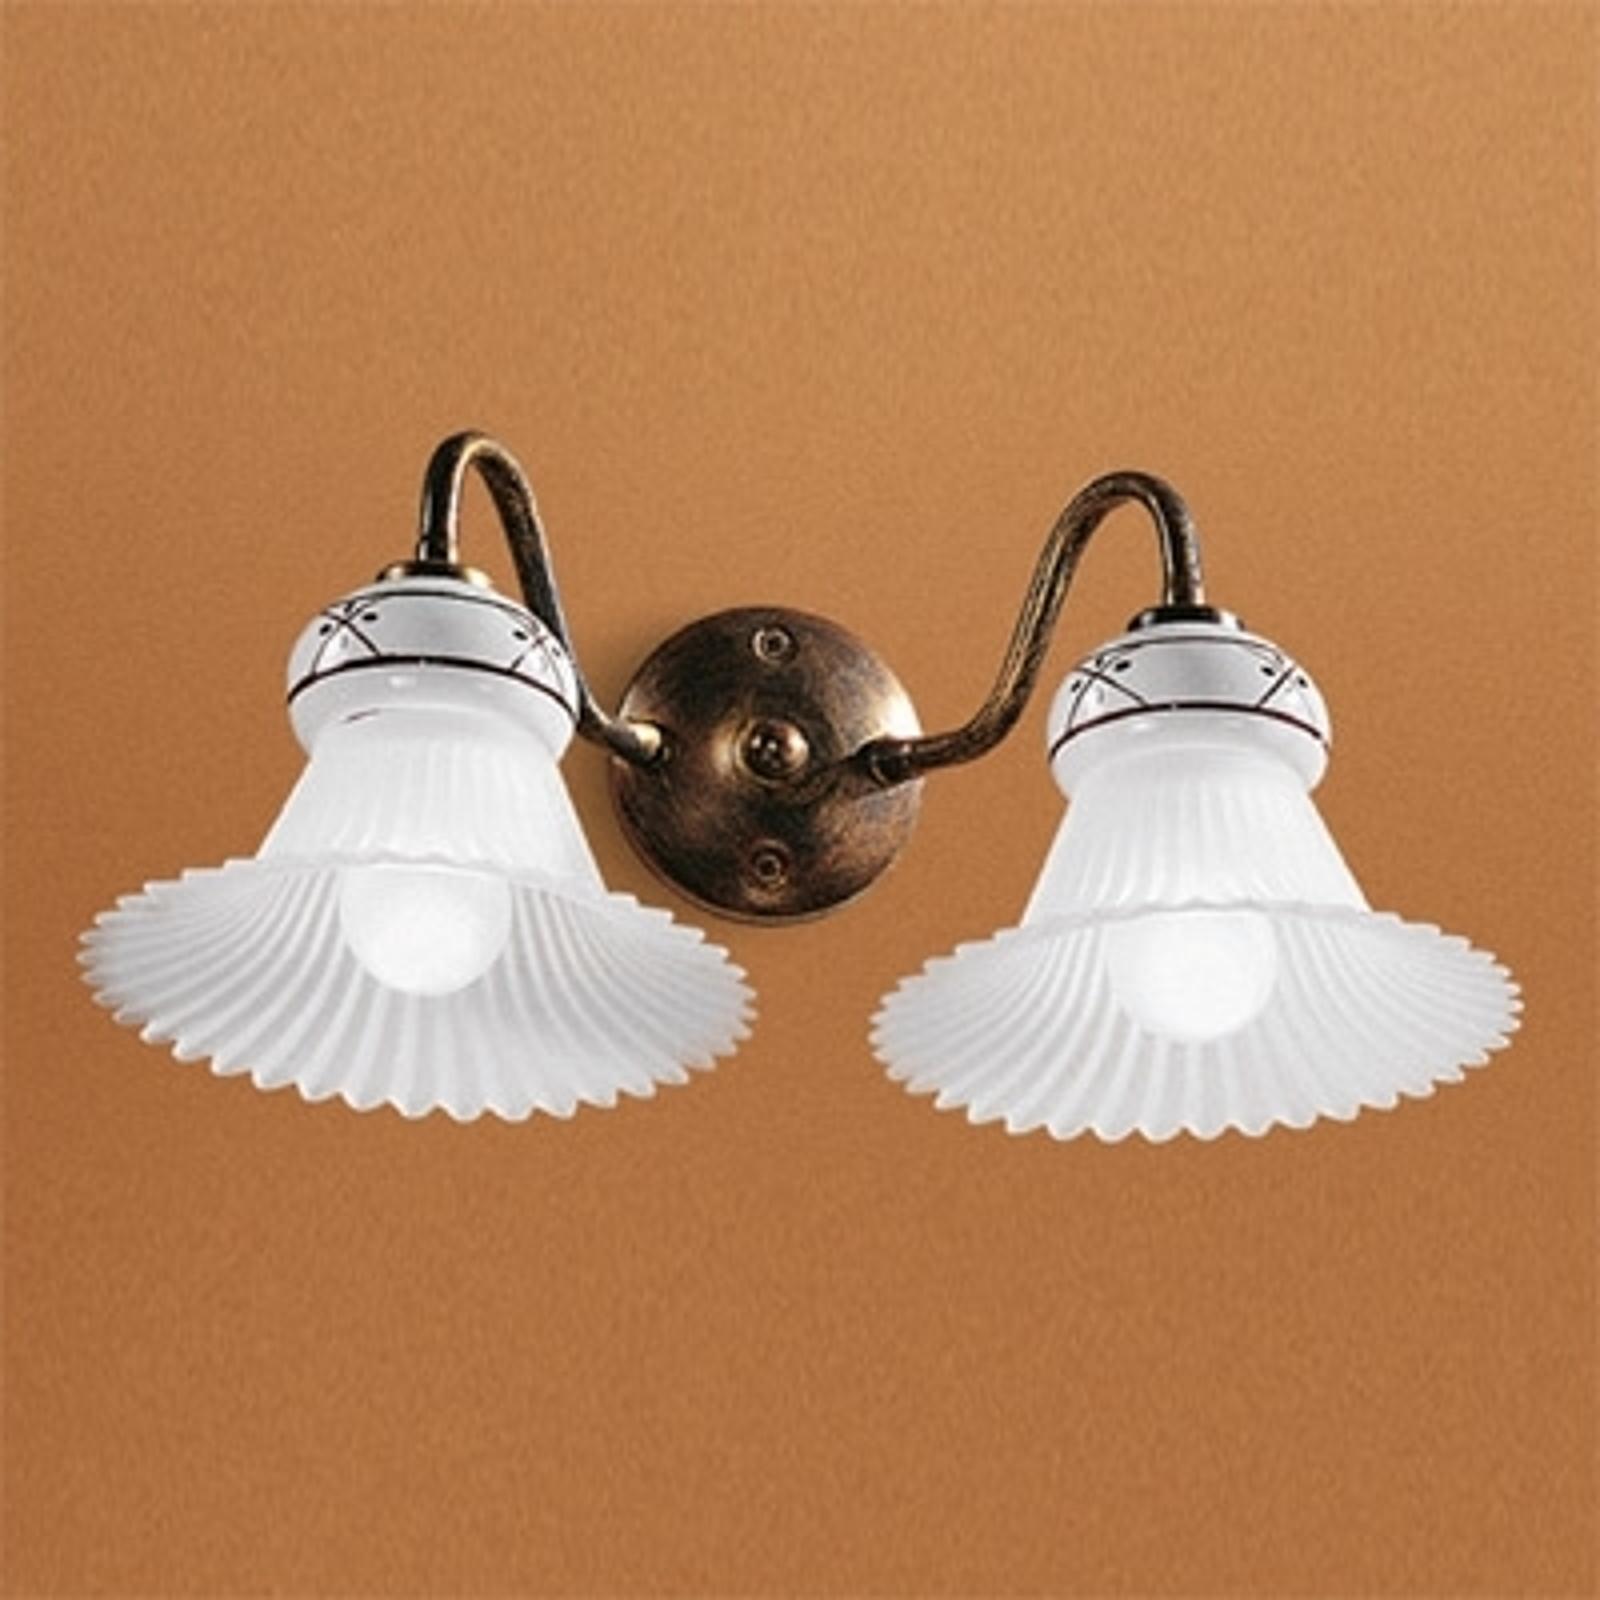 2-lichts Mami wandlamp